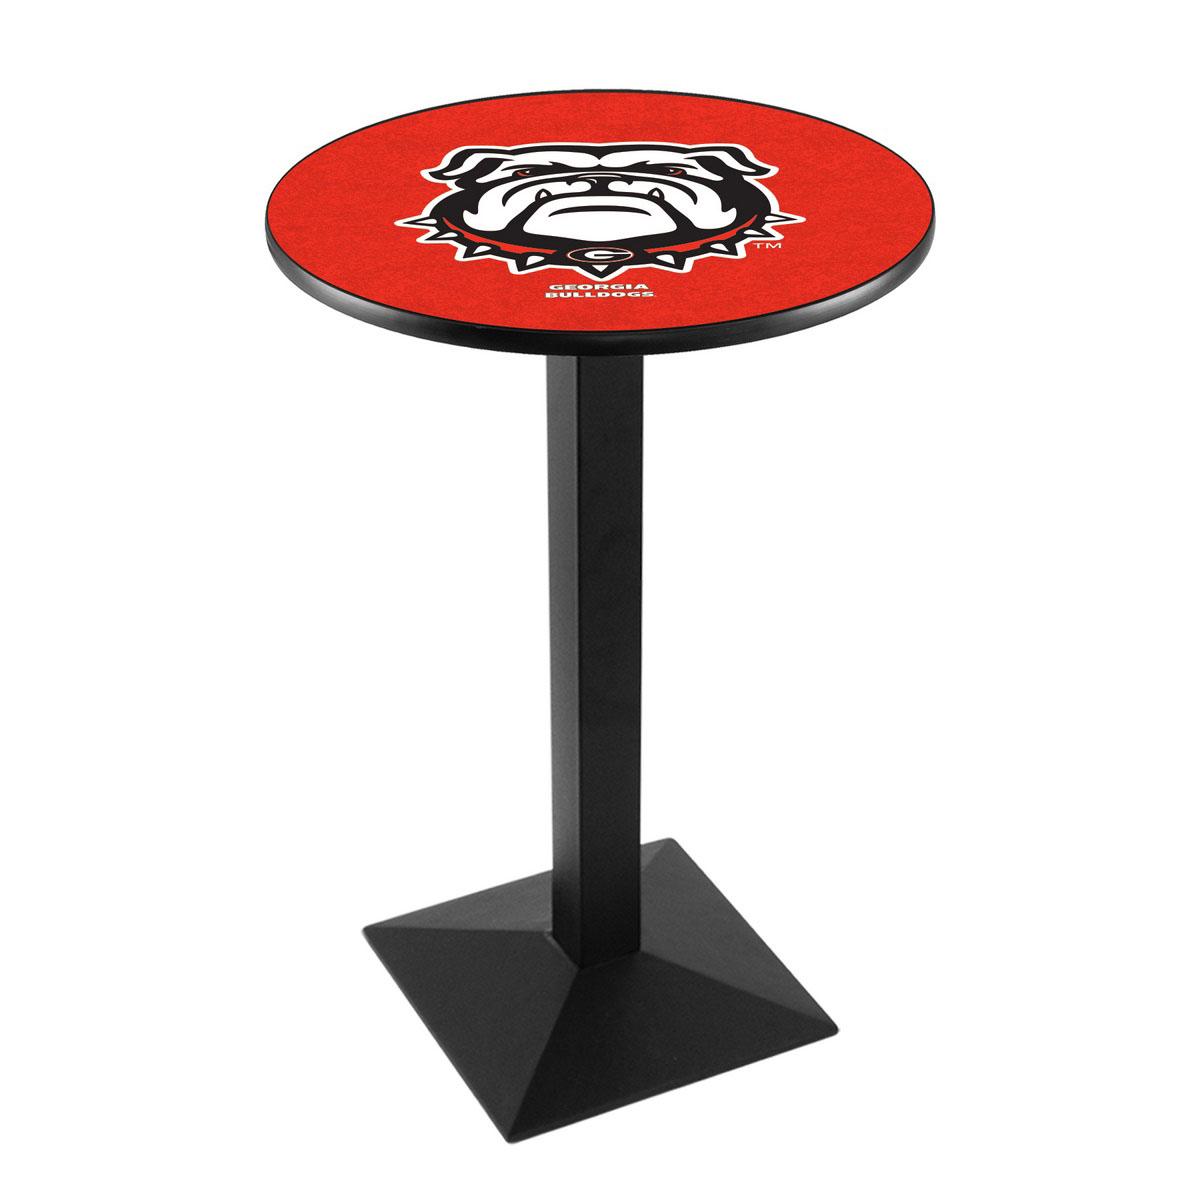 Select University-Georgia-Bulldog-Logo-Pub-Bar-Table-Square-Stand Product Picture 1669